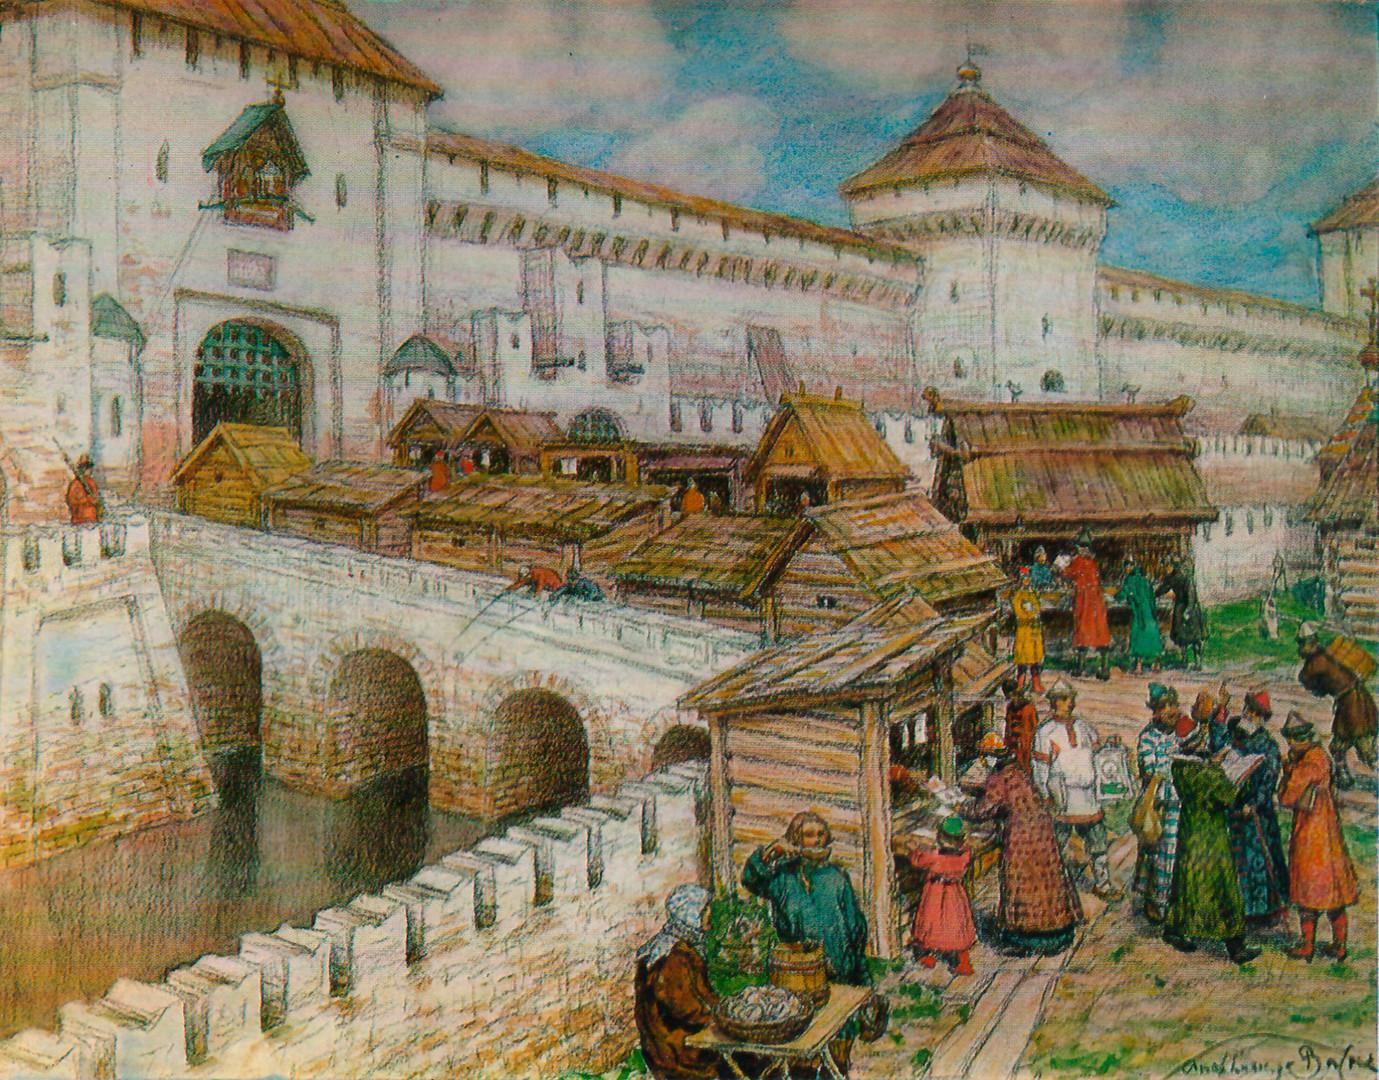 Knjigarne na mostu Spasskij v 17. stoletju.